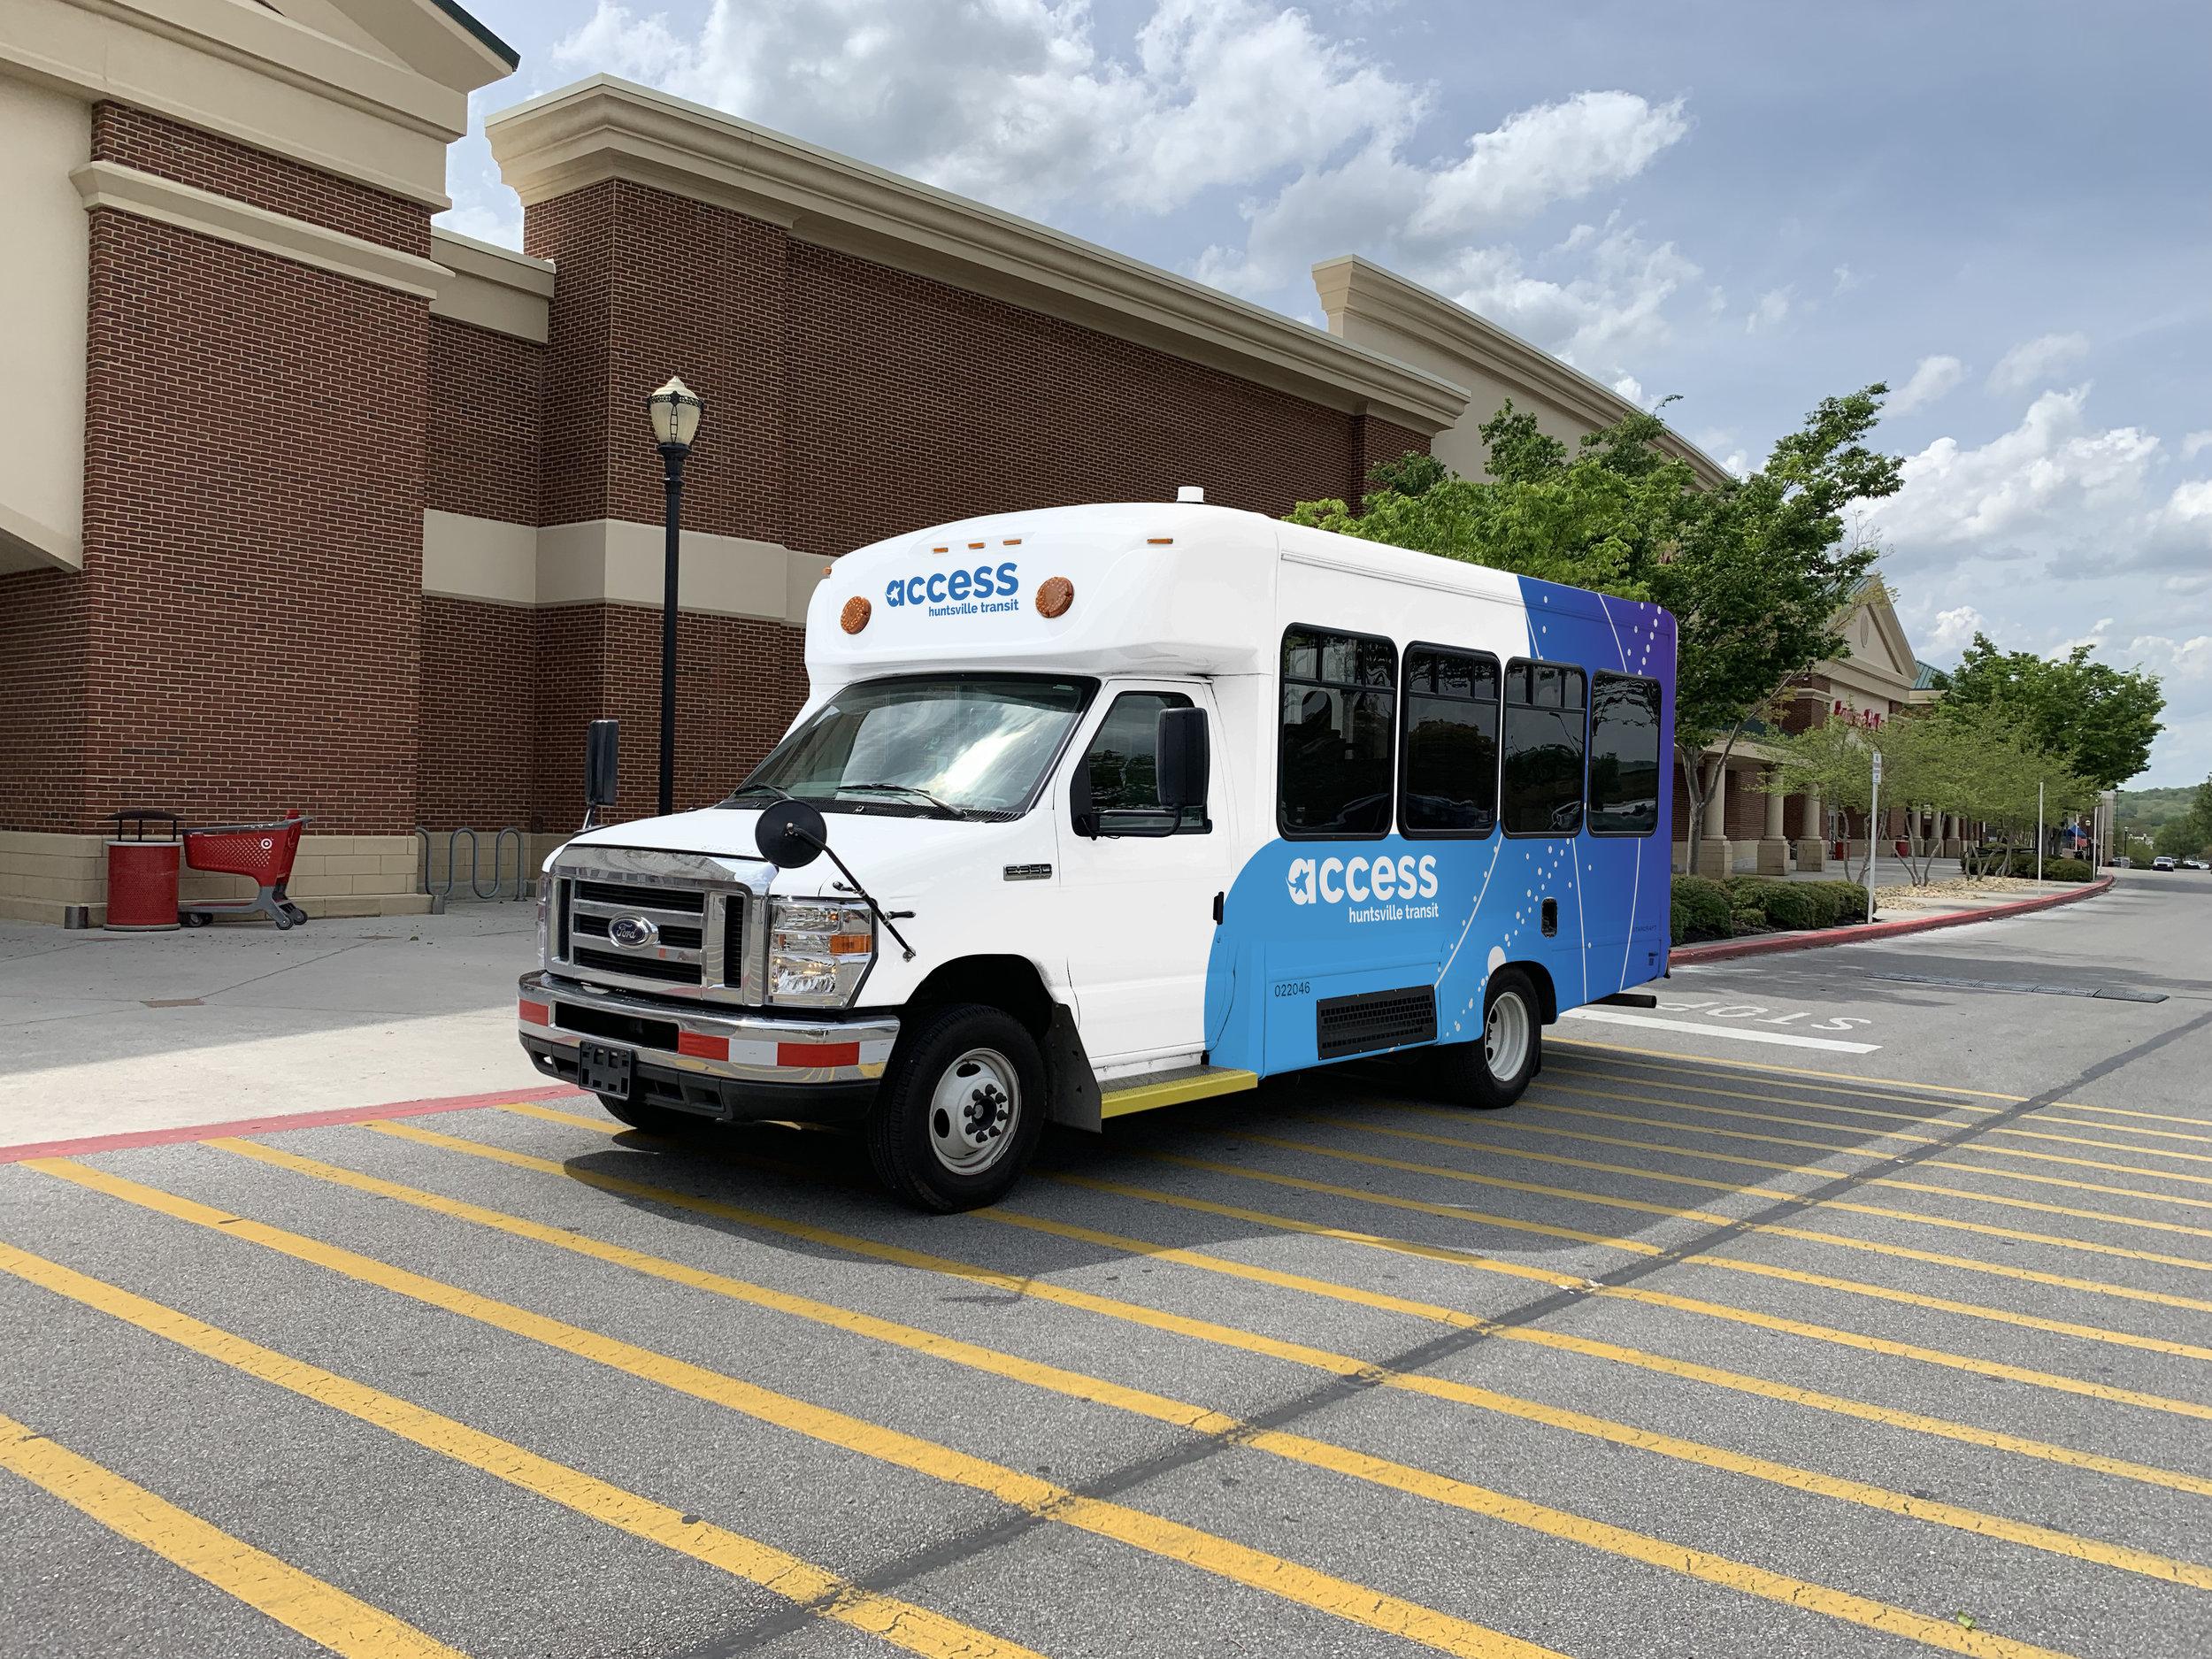 CityofHSV_PublicTransit_Rebrand_CONCEPT4_HuntsvilleAccess_R4-v1-mockup.jpg